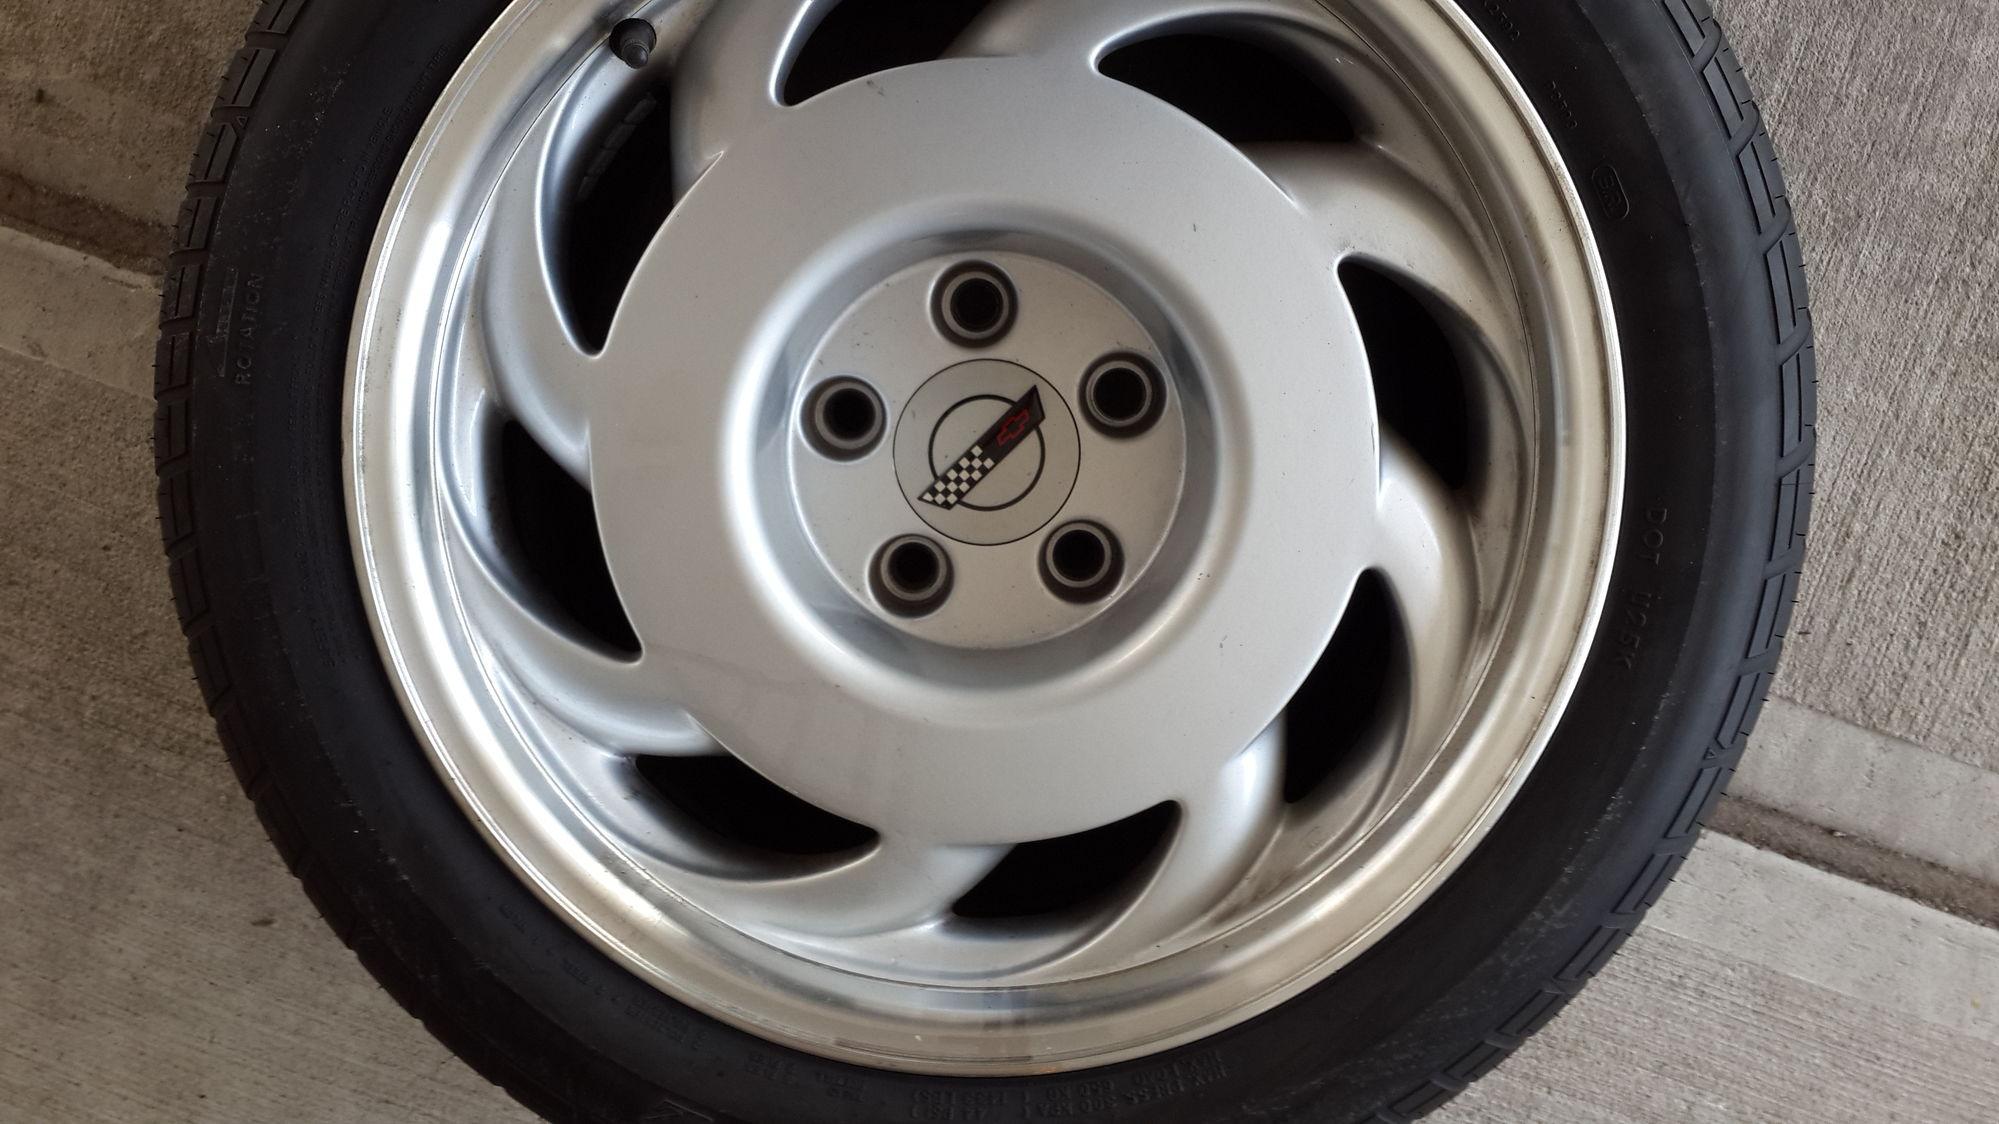 Zr1 rims and tires for sale - CorvetteForum - Chevrolet ...